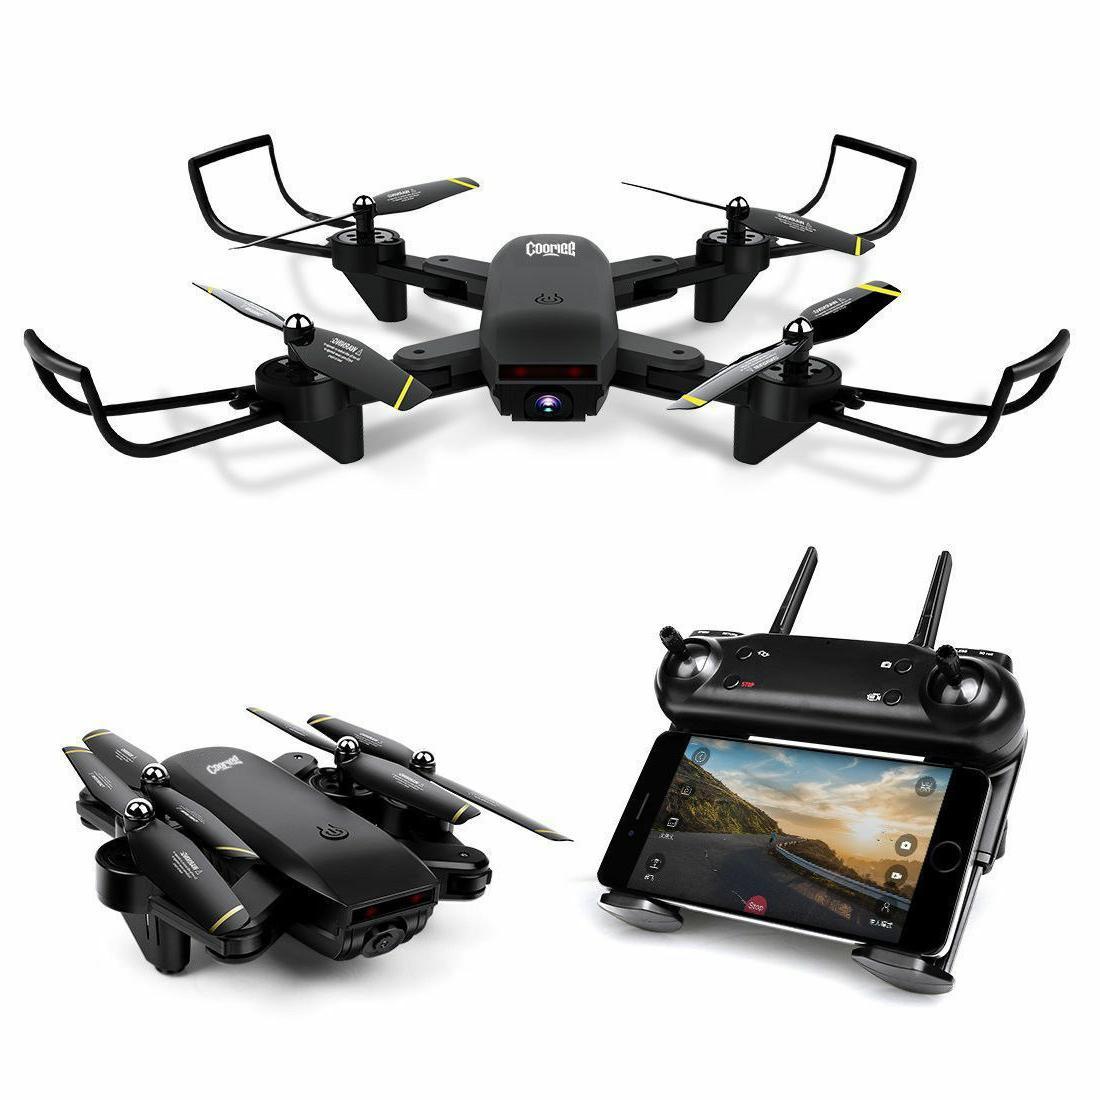 S169 Wifi Flow Quadcopter Dual HD Camera Drone